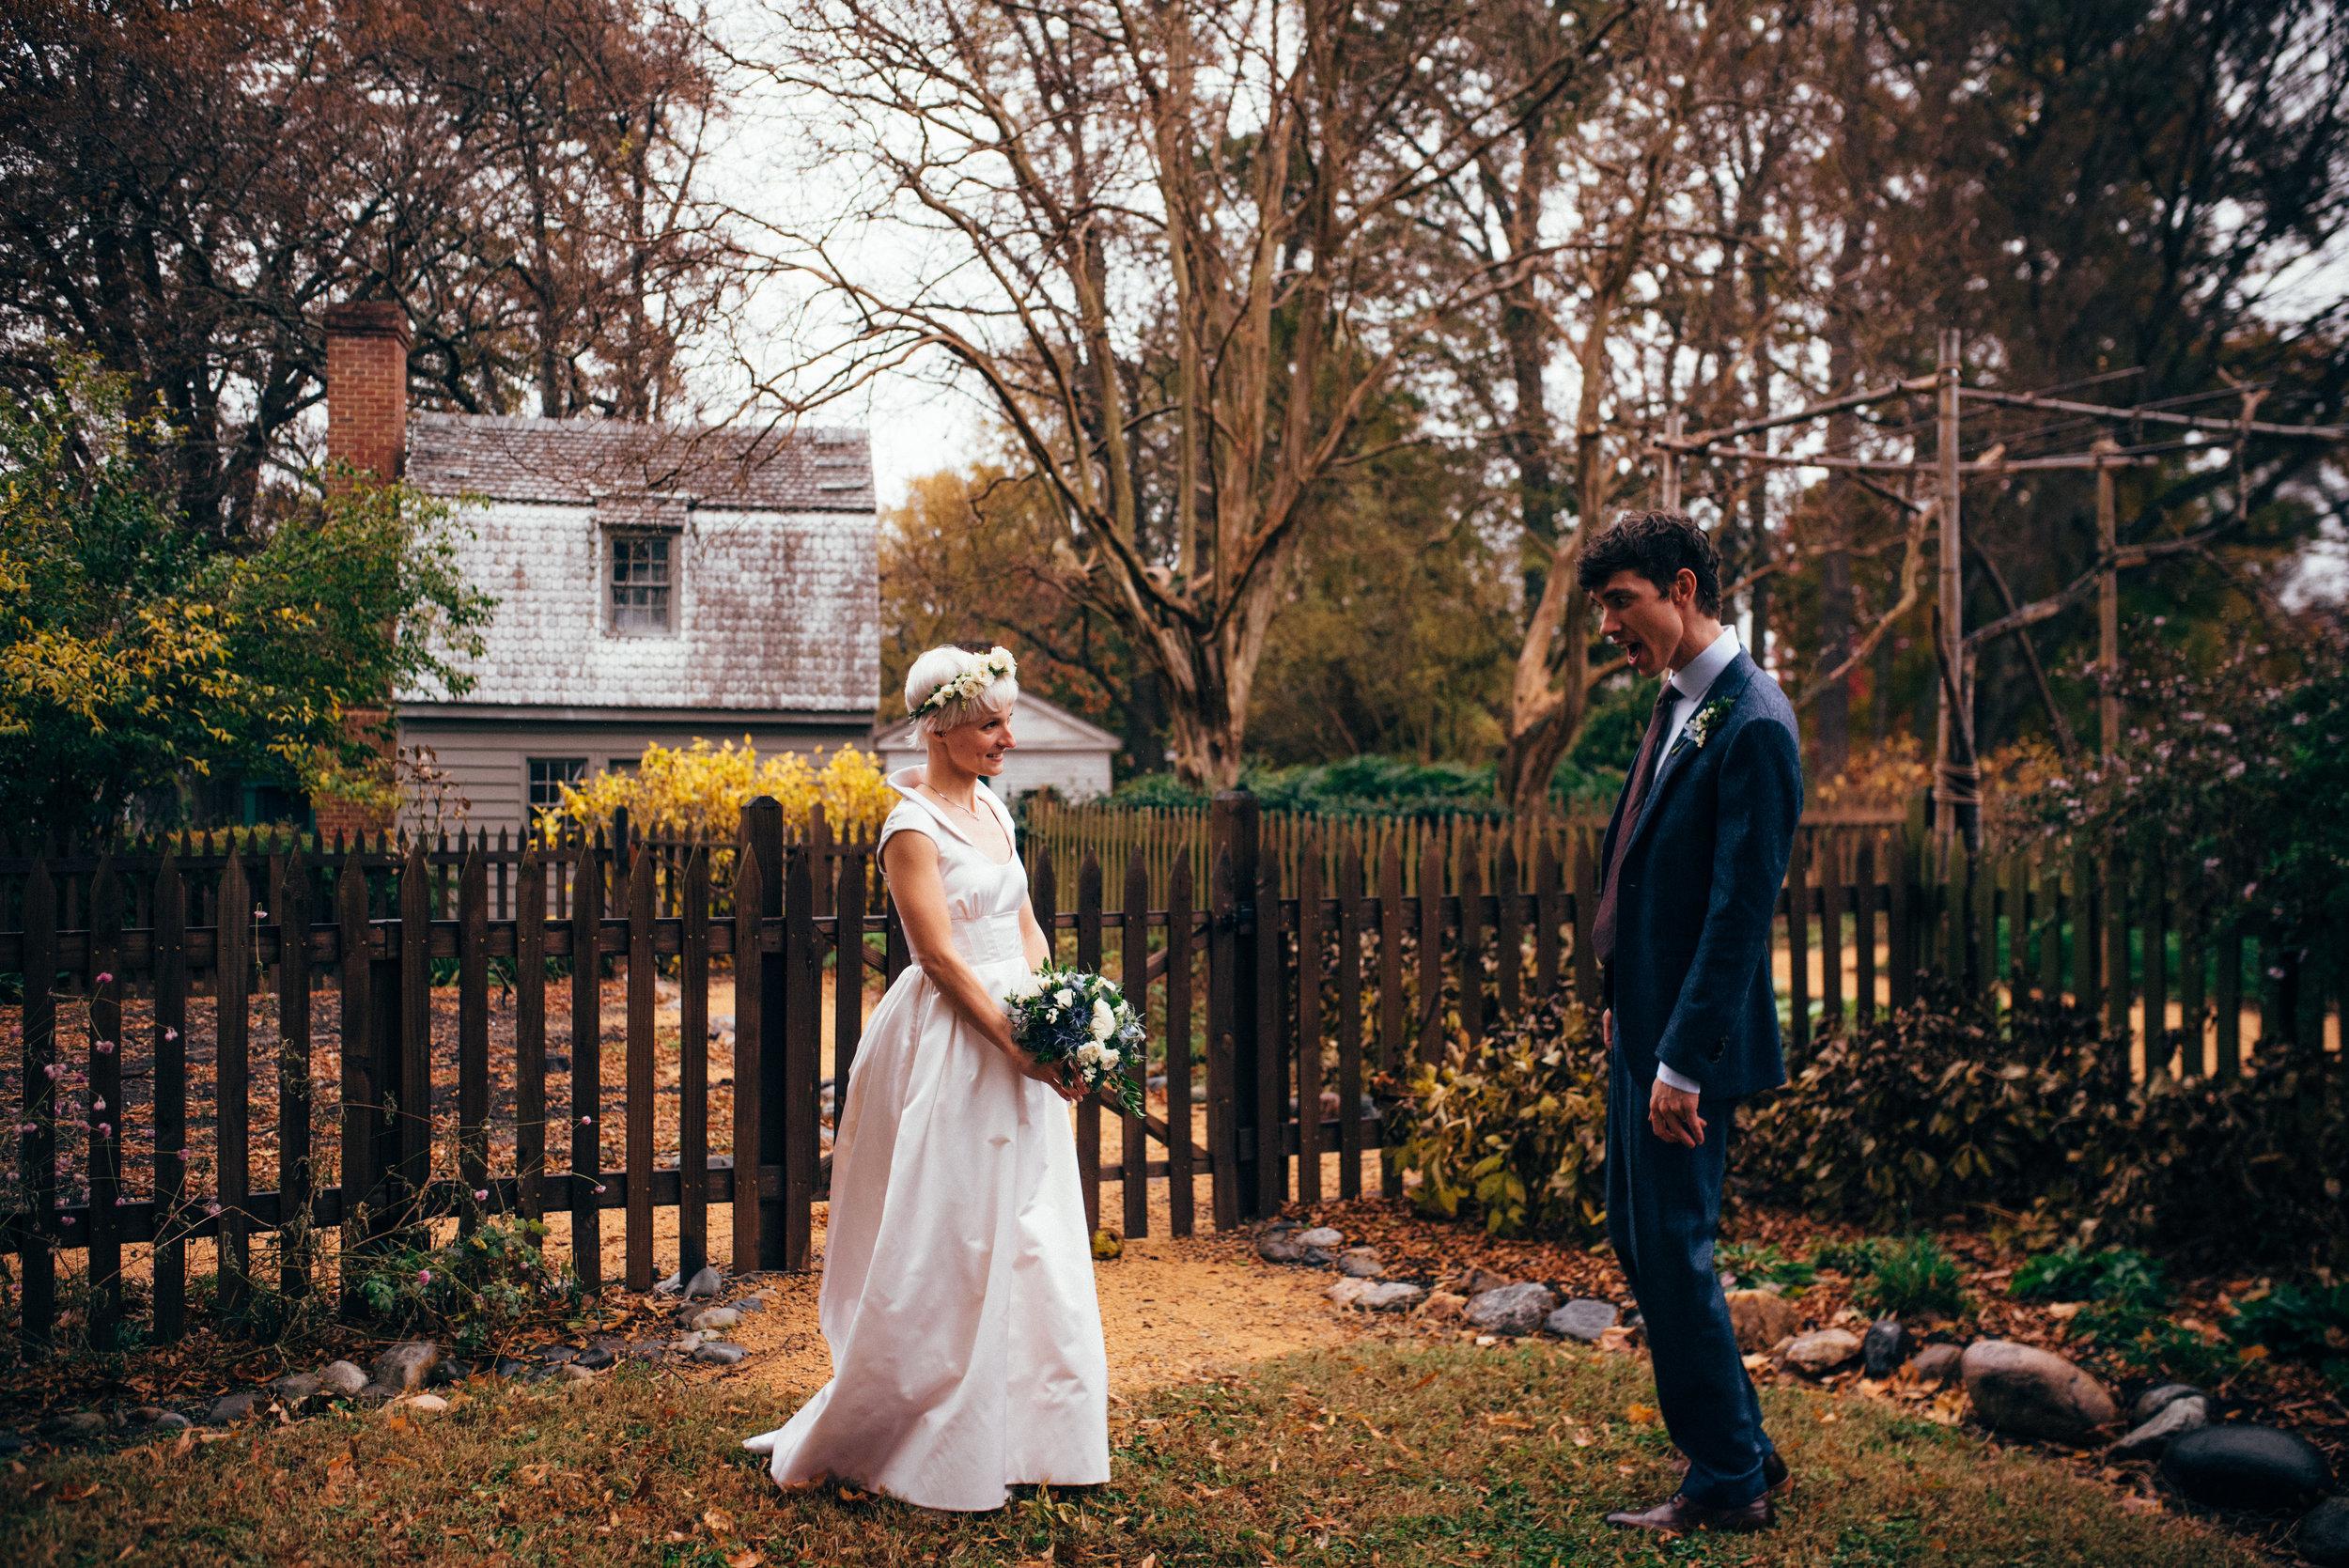 raleigh wedding photographer - north carolina wedding photographer - downtown raleigh wedding photographer